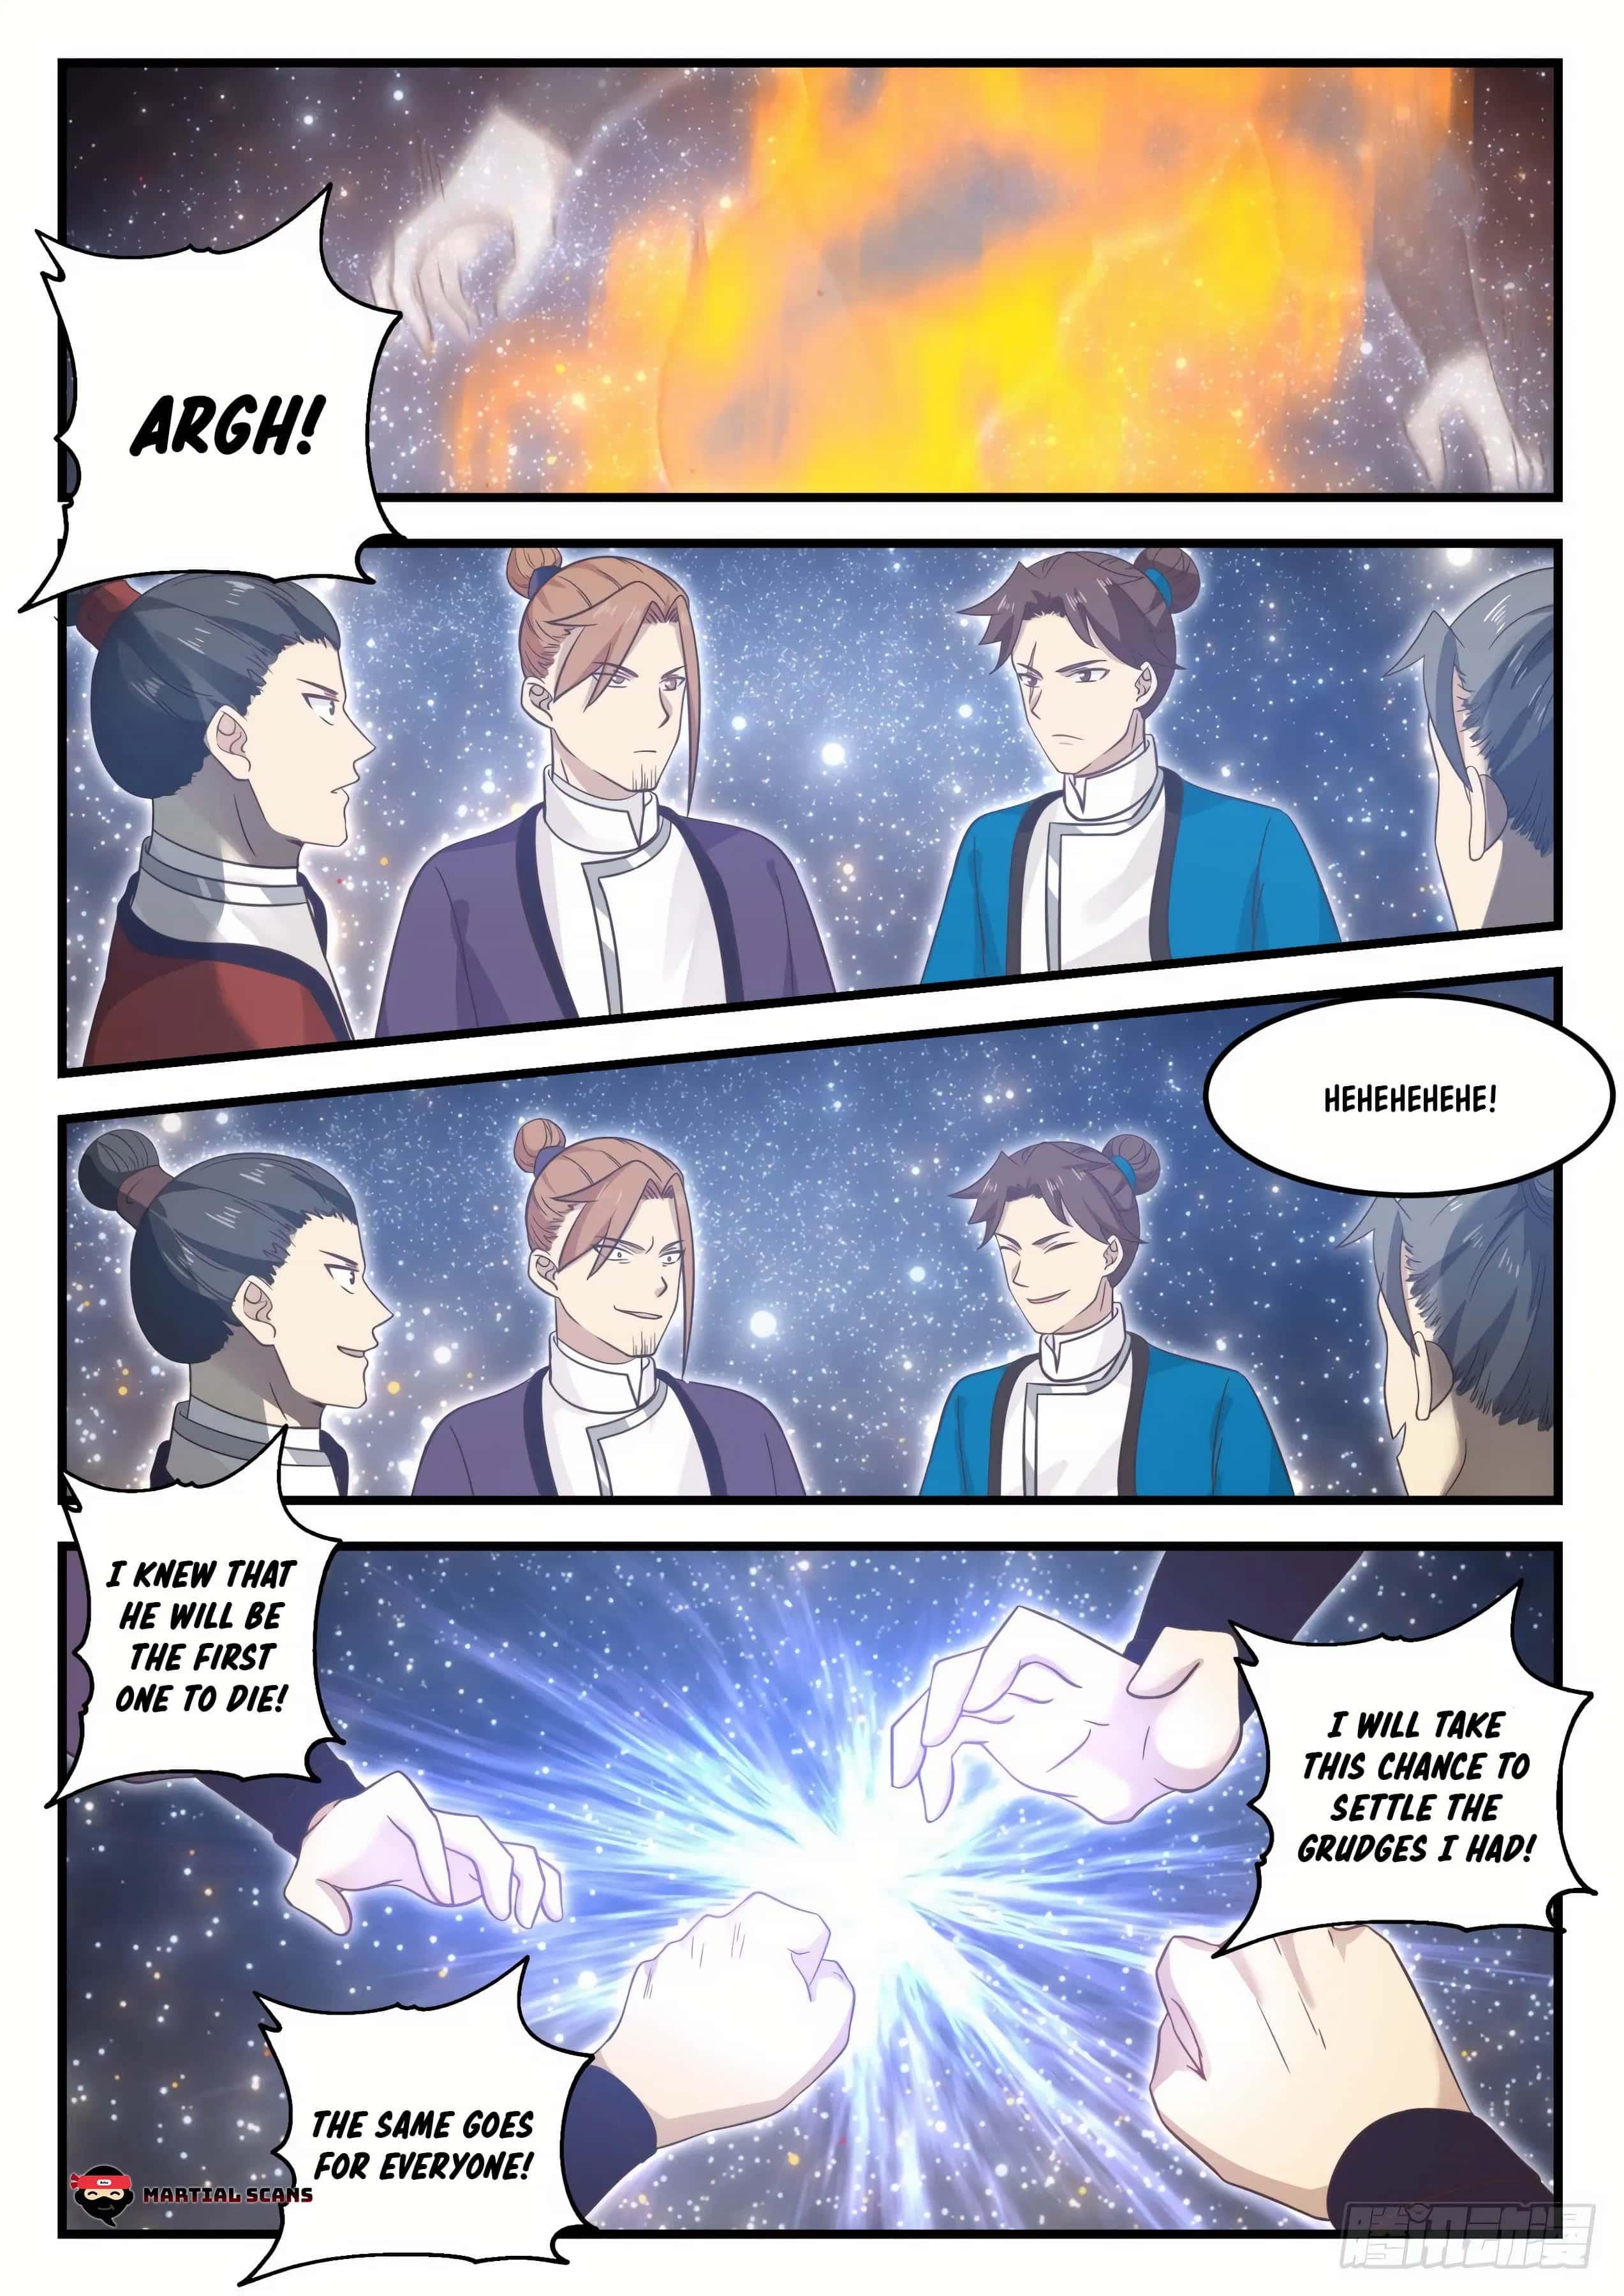 Martial Peak - chapter 704-eng-li